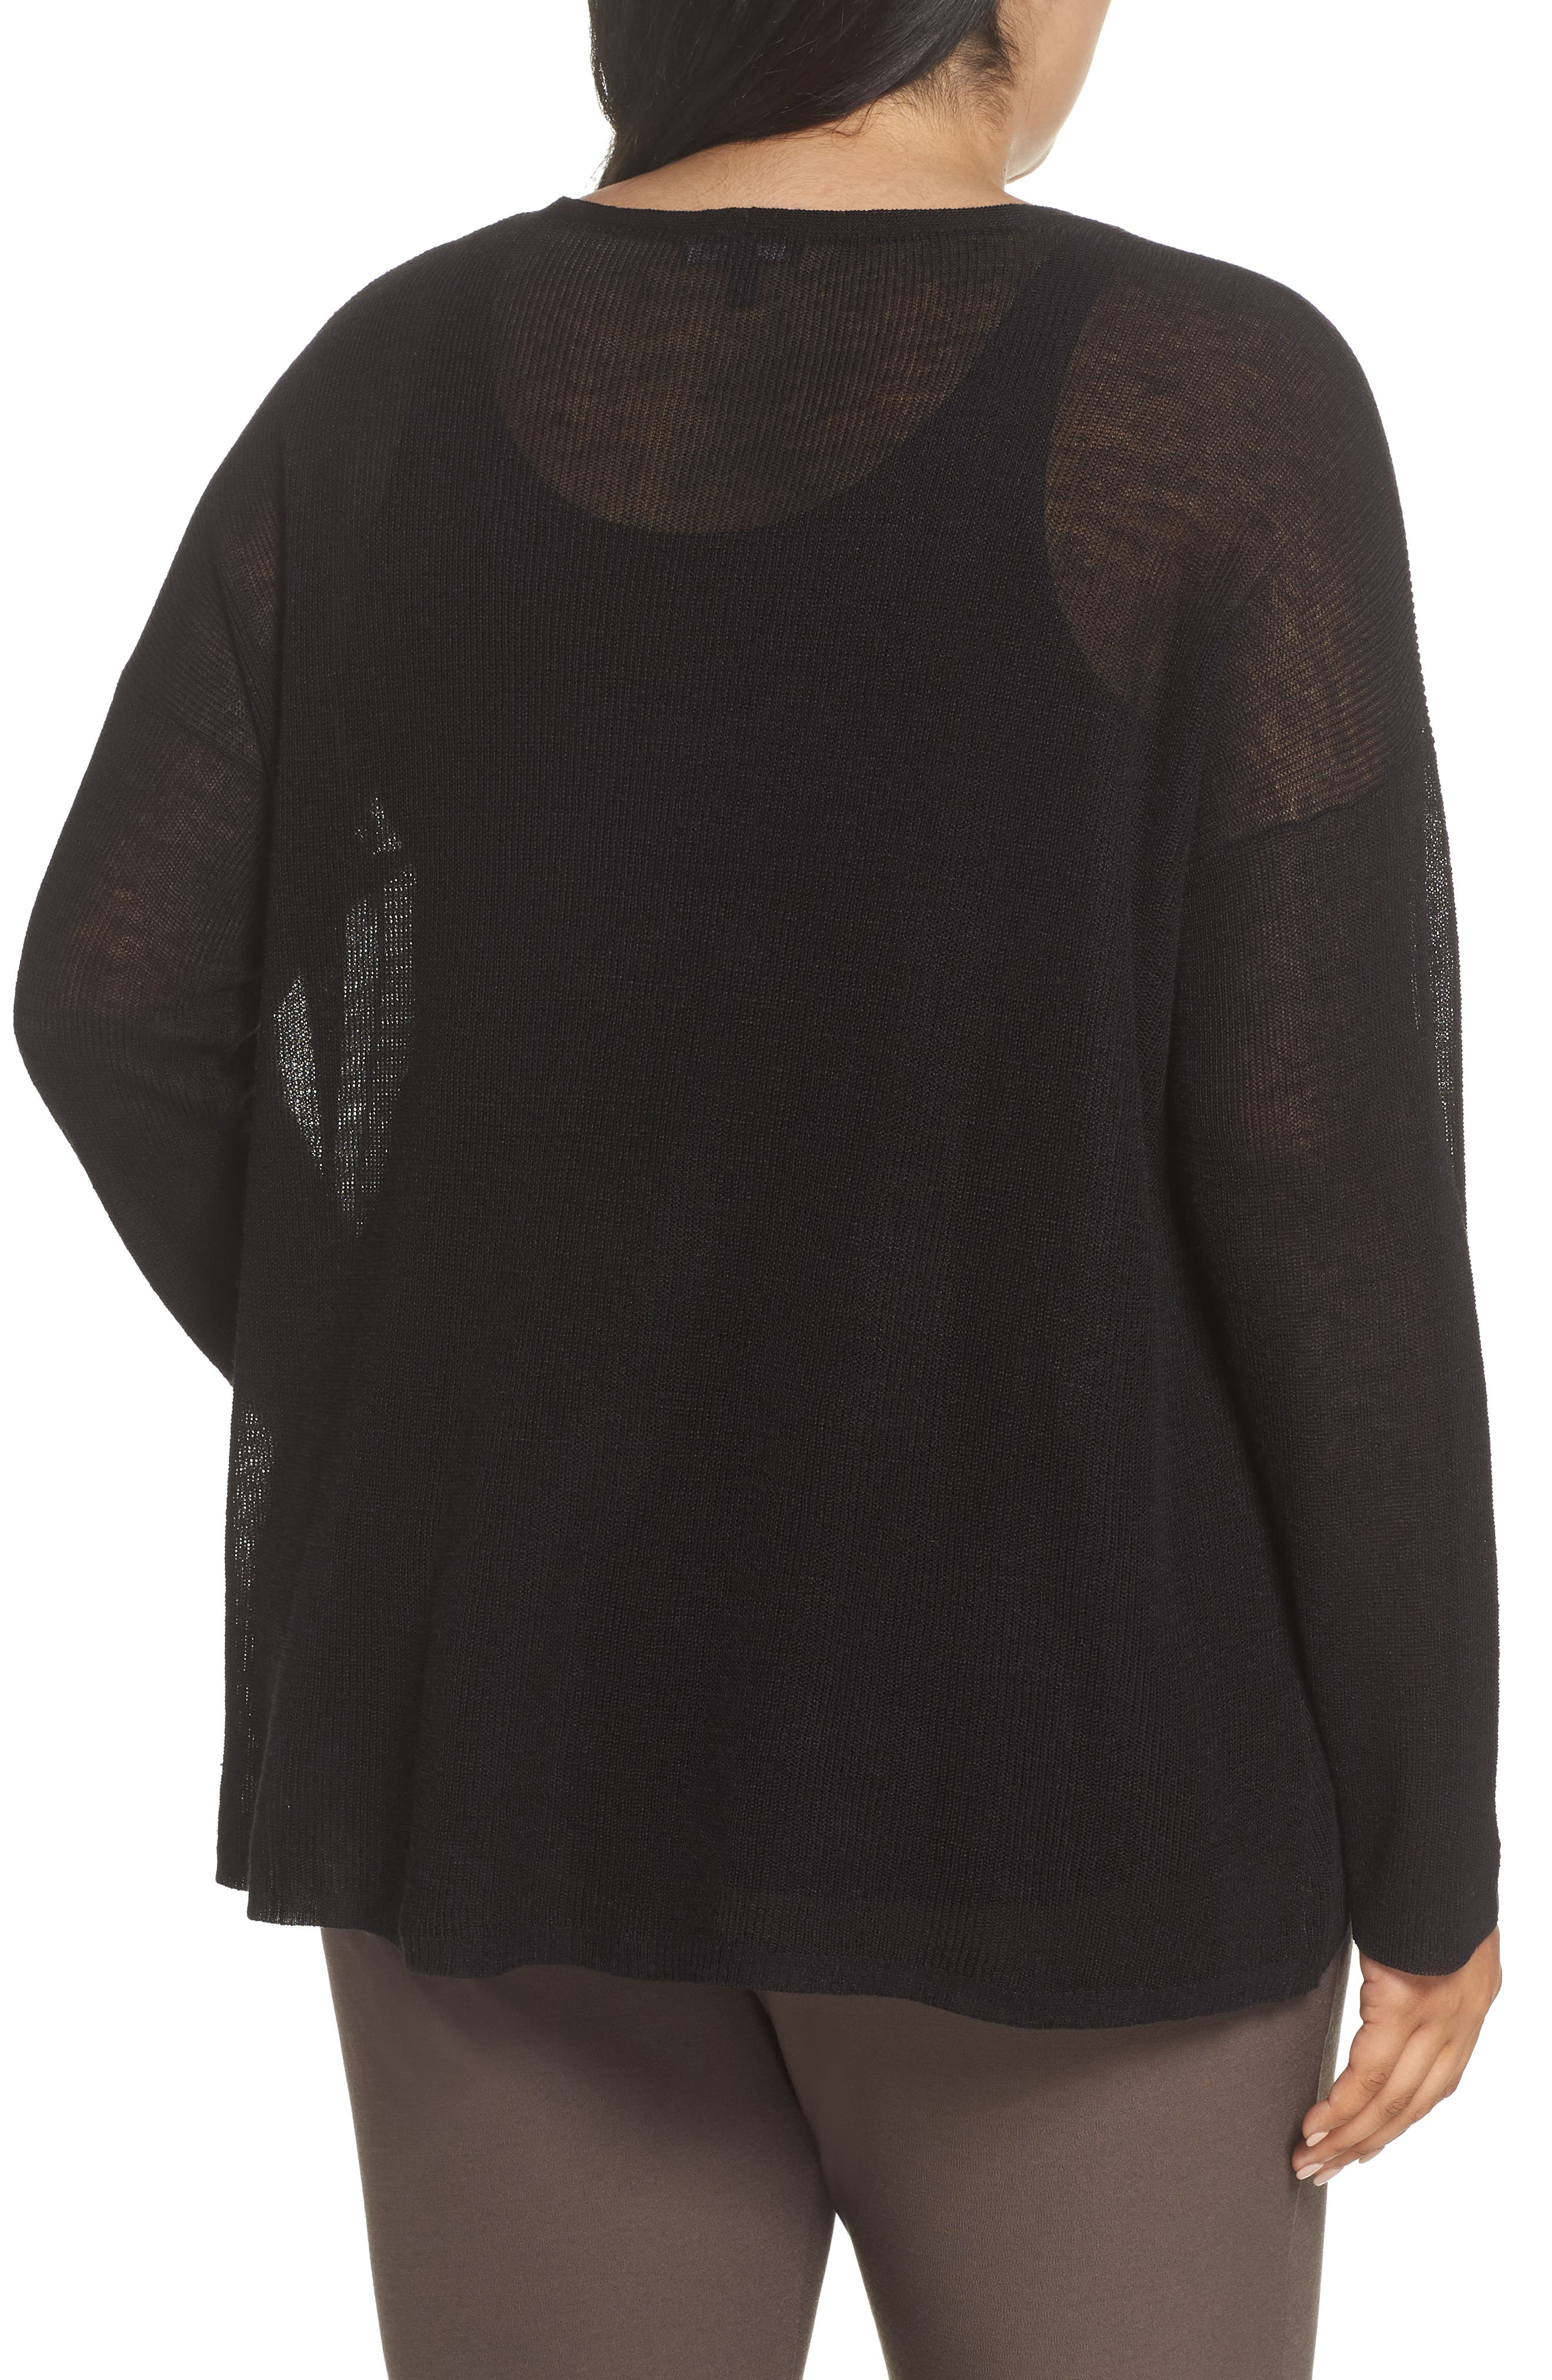 Boxy Organic Linen Blend Sweater,                             Alternate thumbnail 2, color,                             001